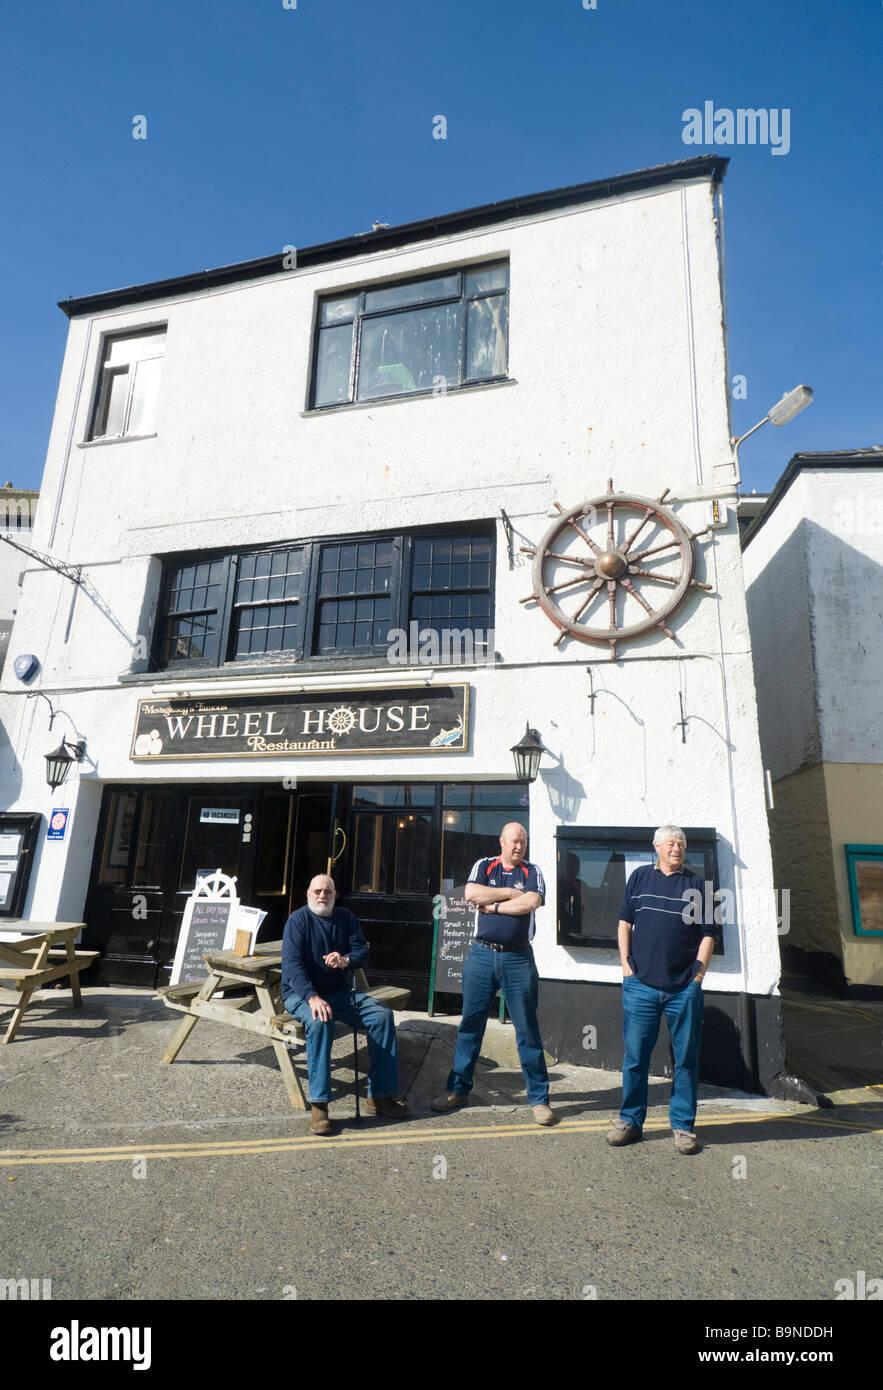 Wheel House Pub Mevagissey Cornwall UK - Stock Image